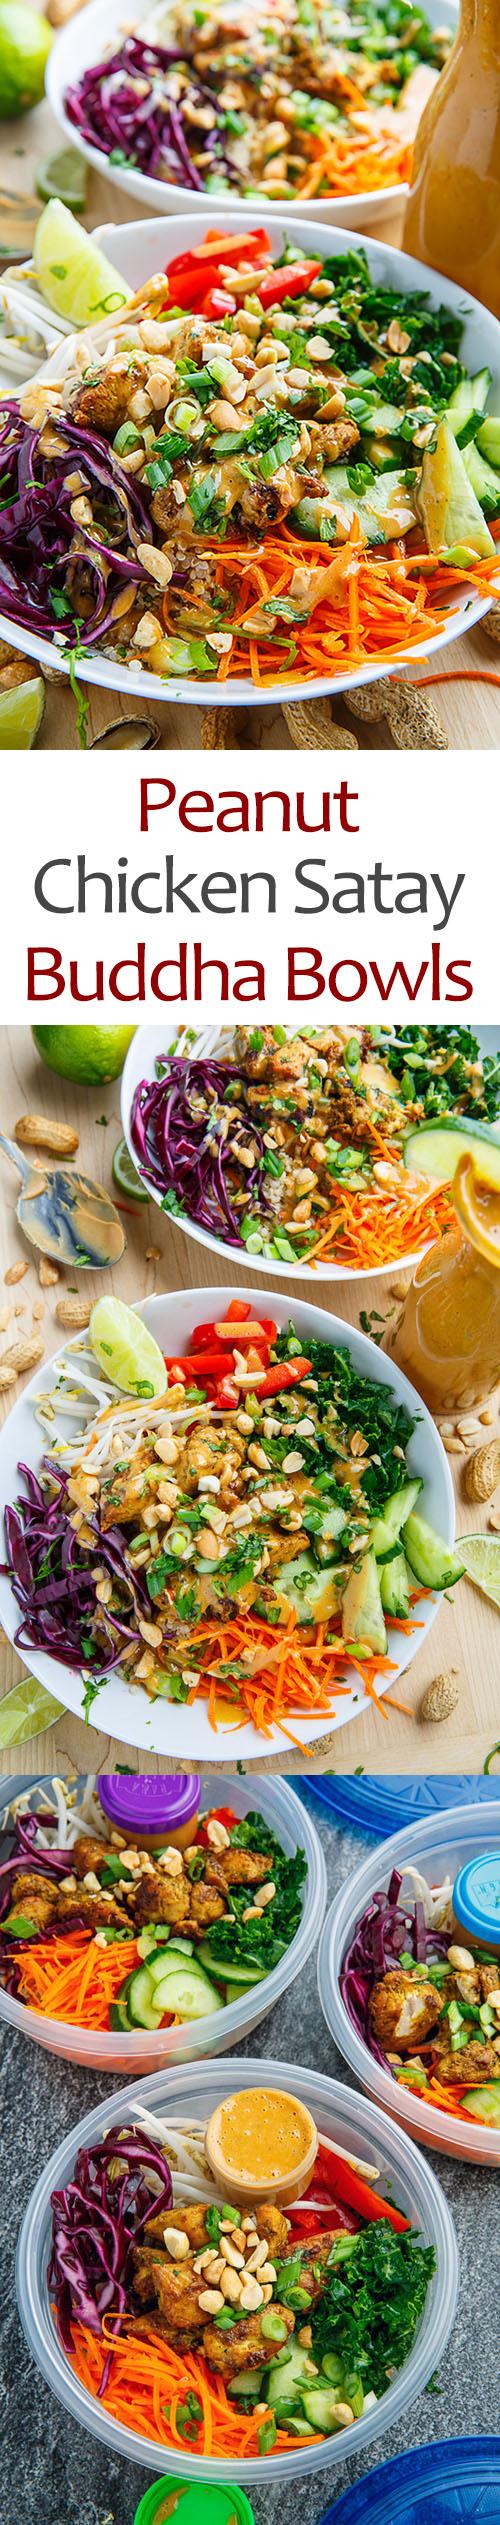 Thai Peanut Chicken Buddha Bowls - Meal Prep